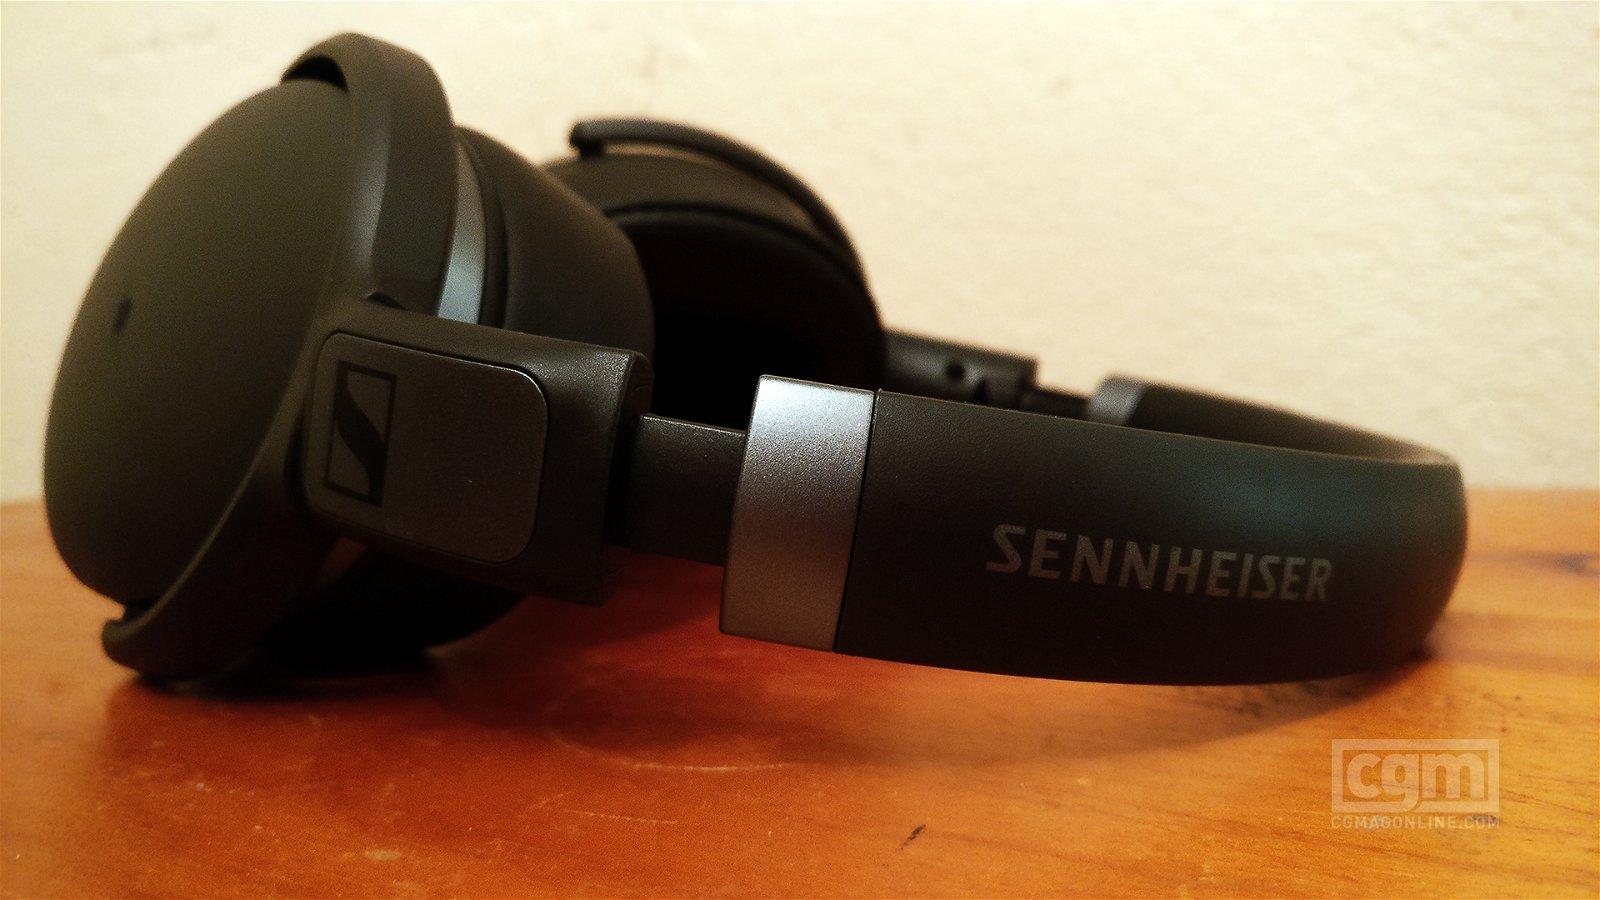 Sennheiser 4 40bt Headphones Review